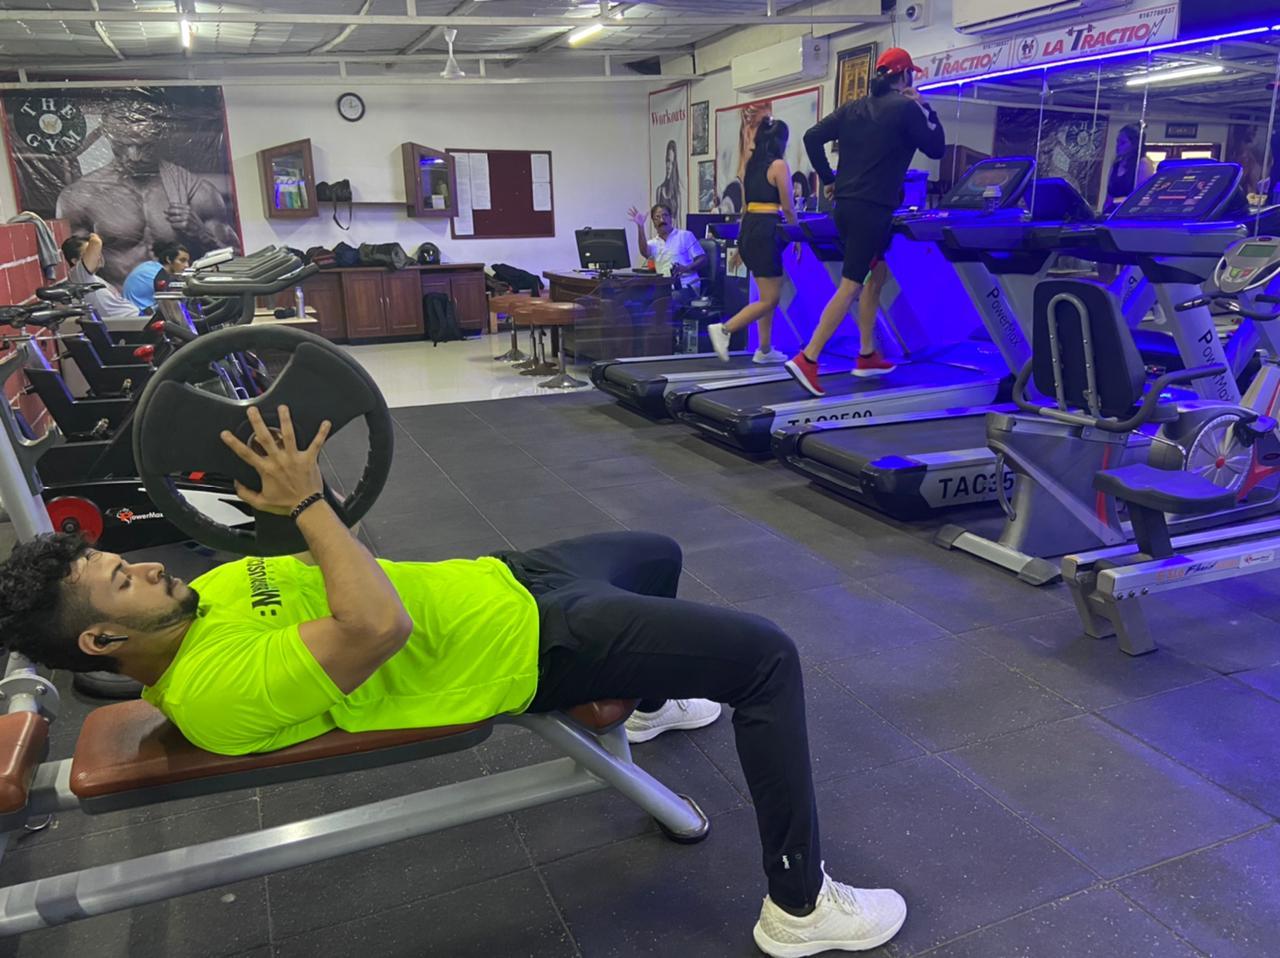 La Traction Gym Versova